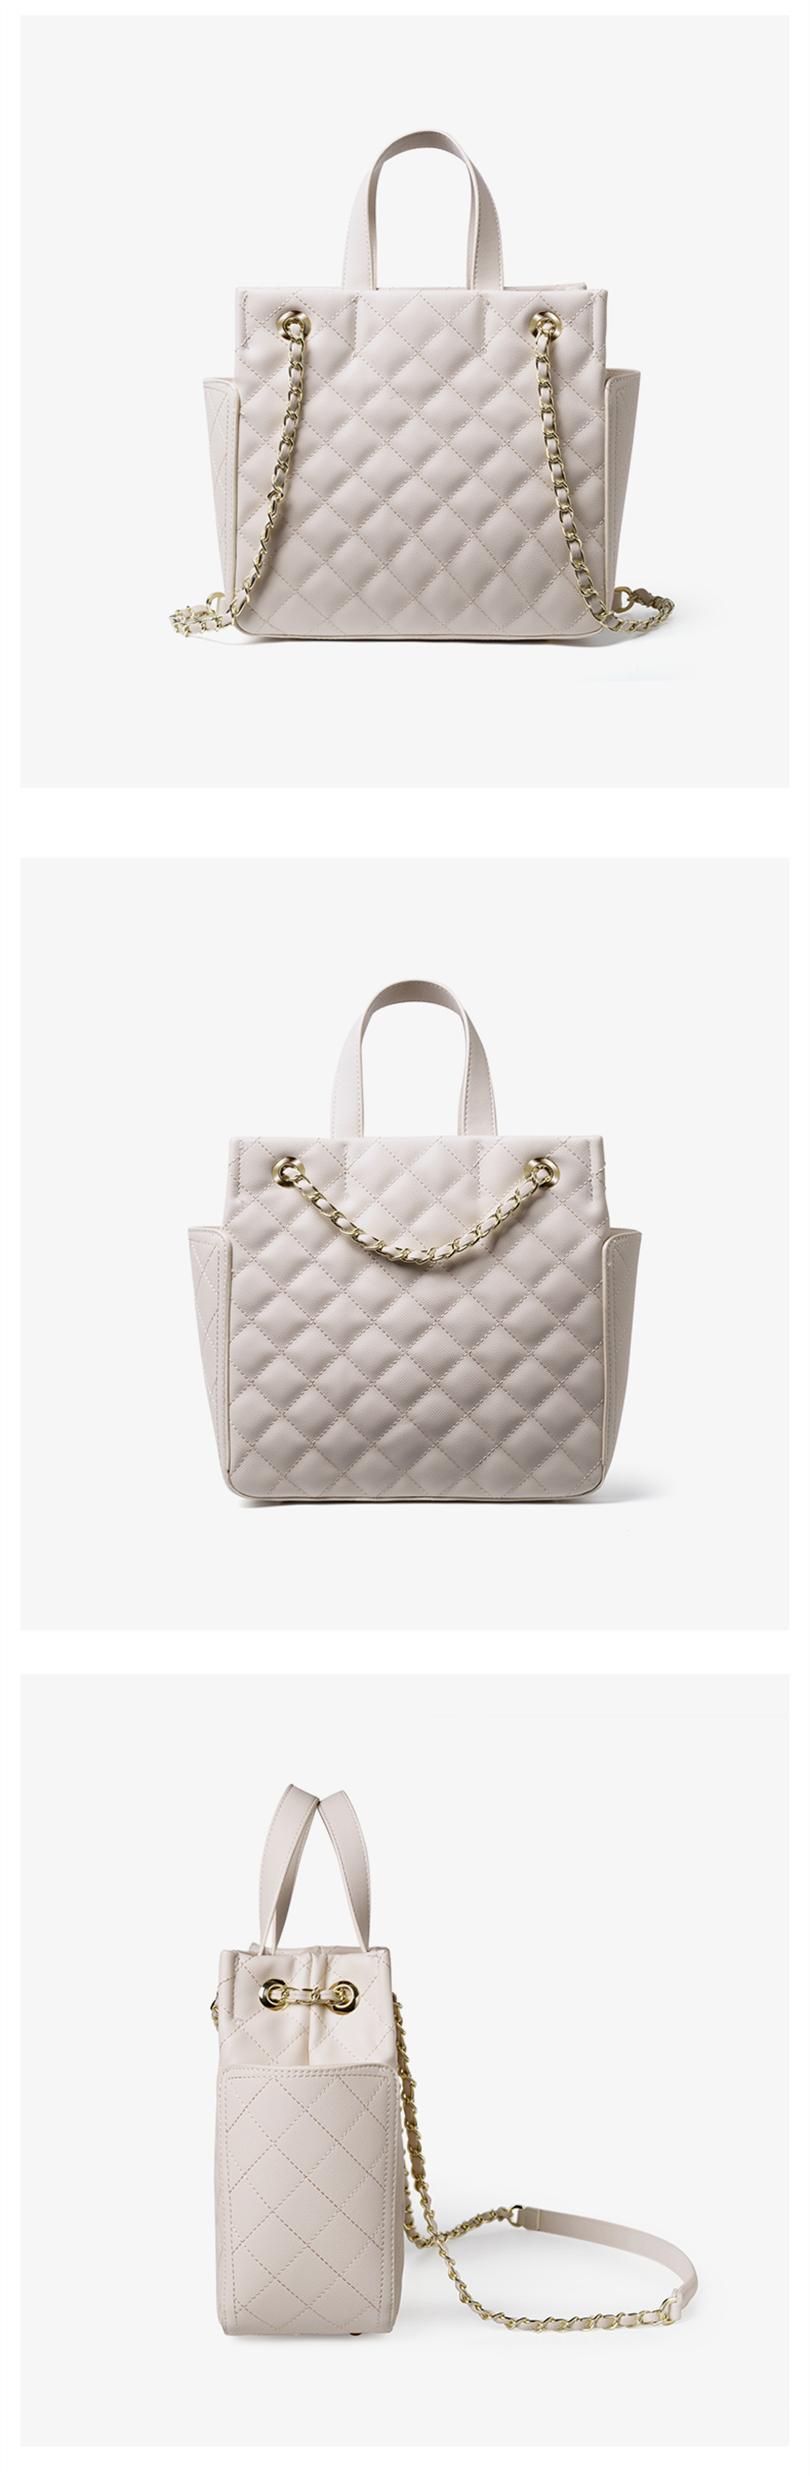 lady bag  (23).jpg